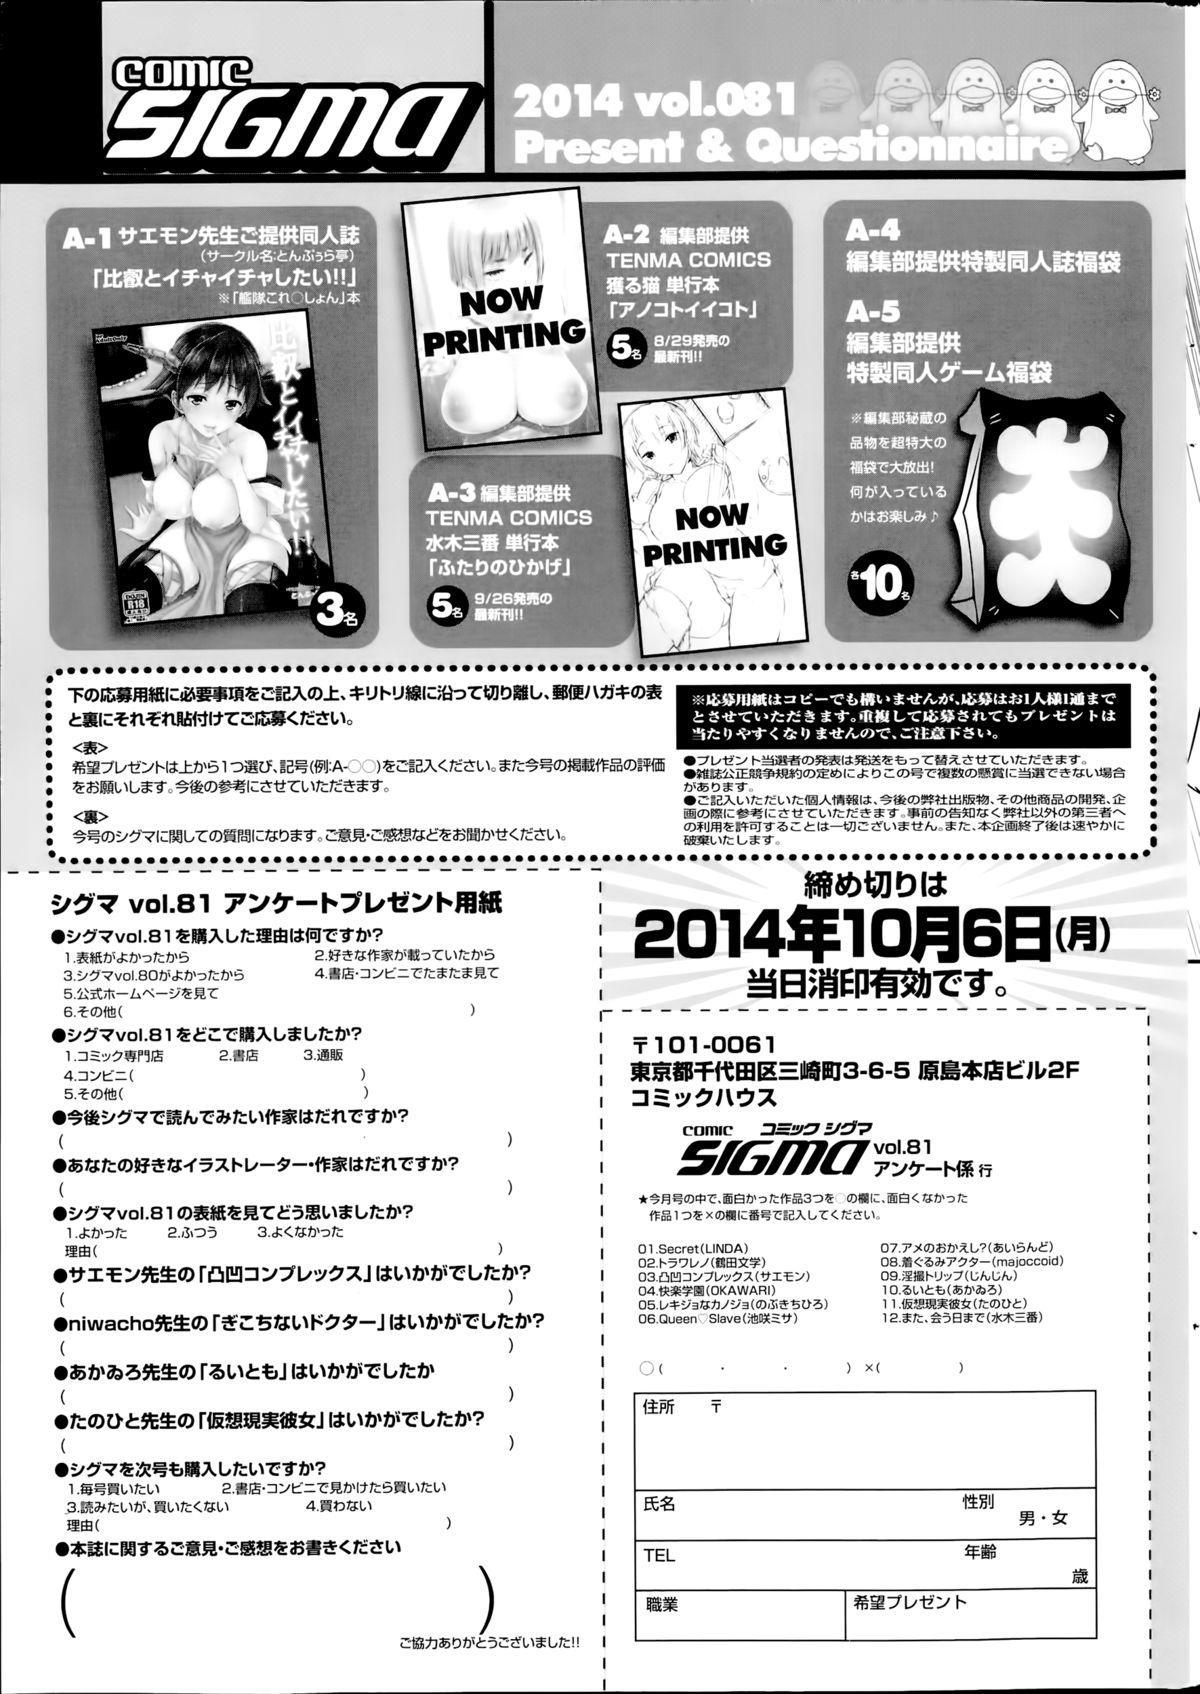 COMIC SIGMA 2014-09 Vol.81 262